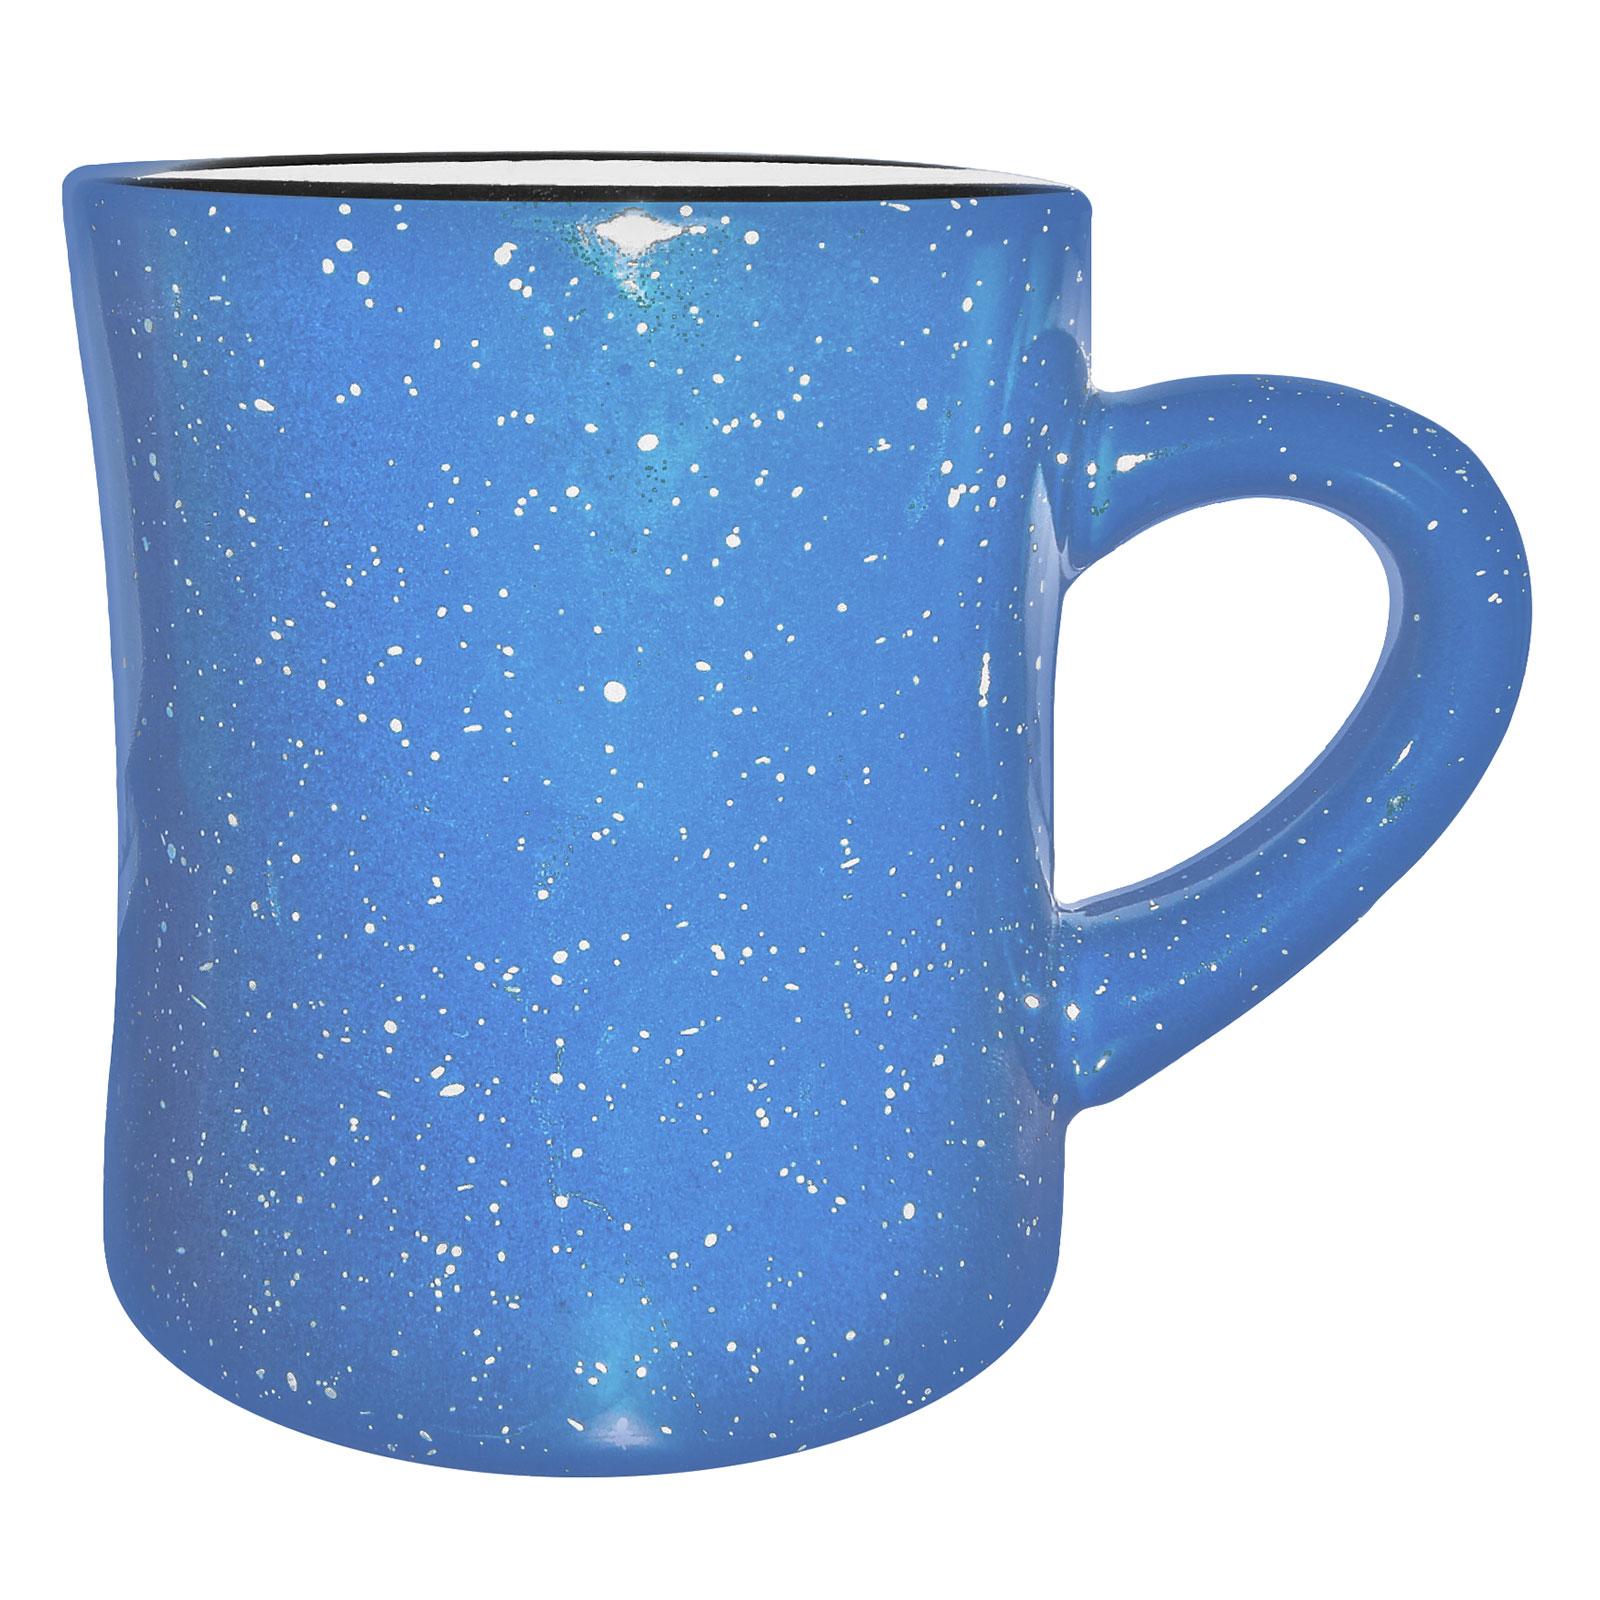 International Tableware 82245-02/06 mug, china